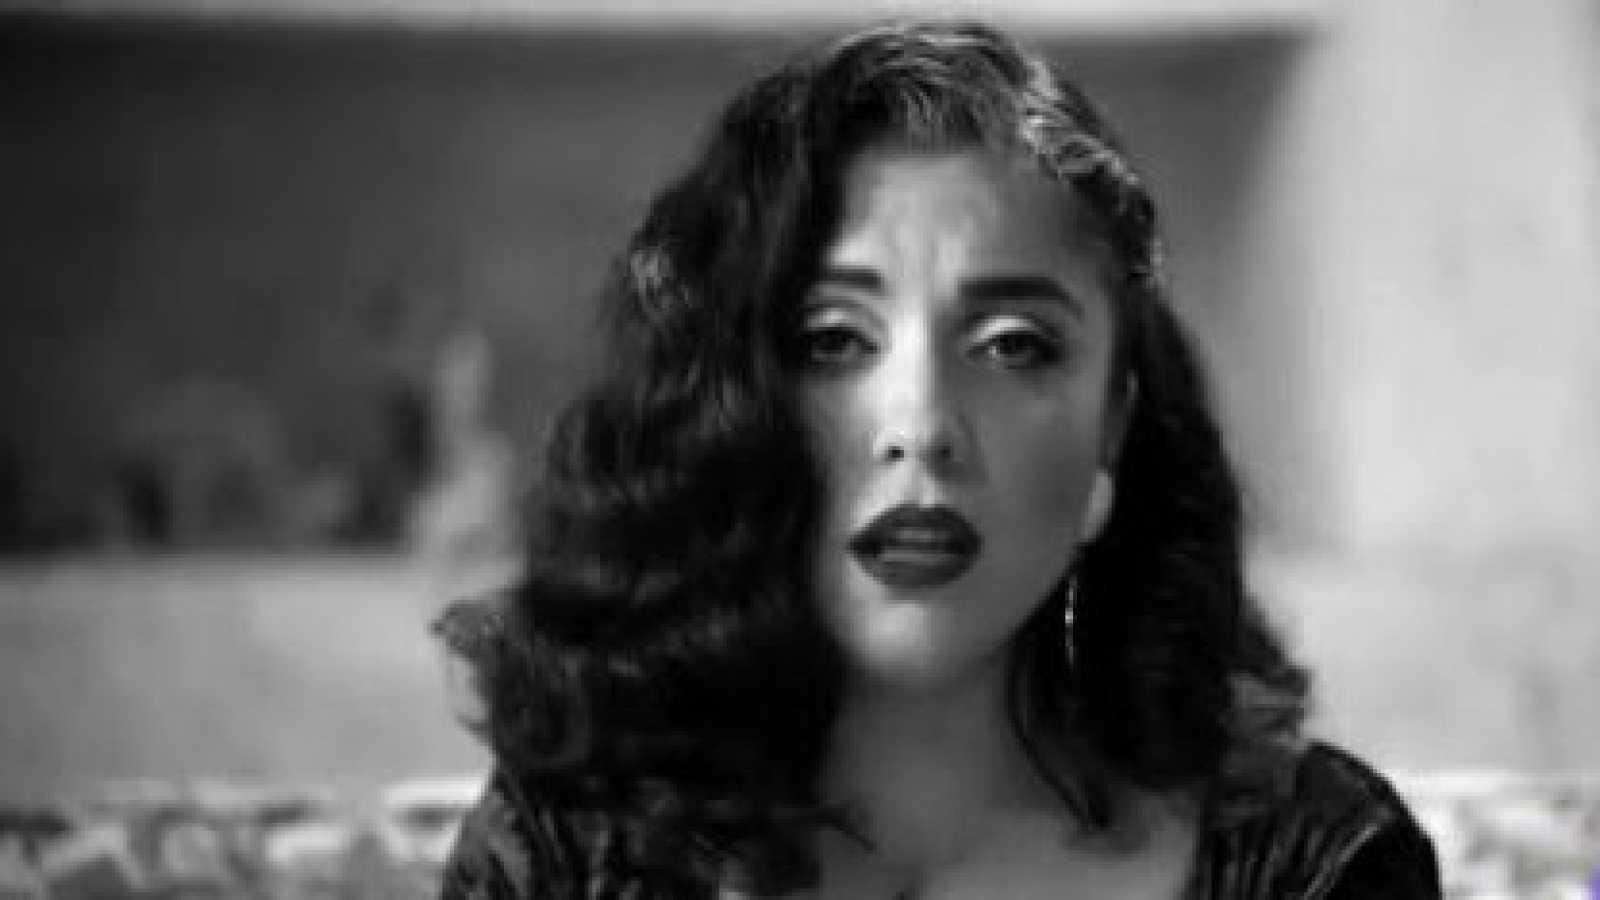 La cantante chilena Mon Laferte presenta su nuevo disco con un dueto con Alejandro Fernández